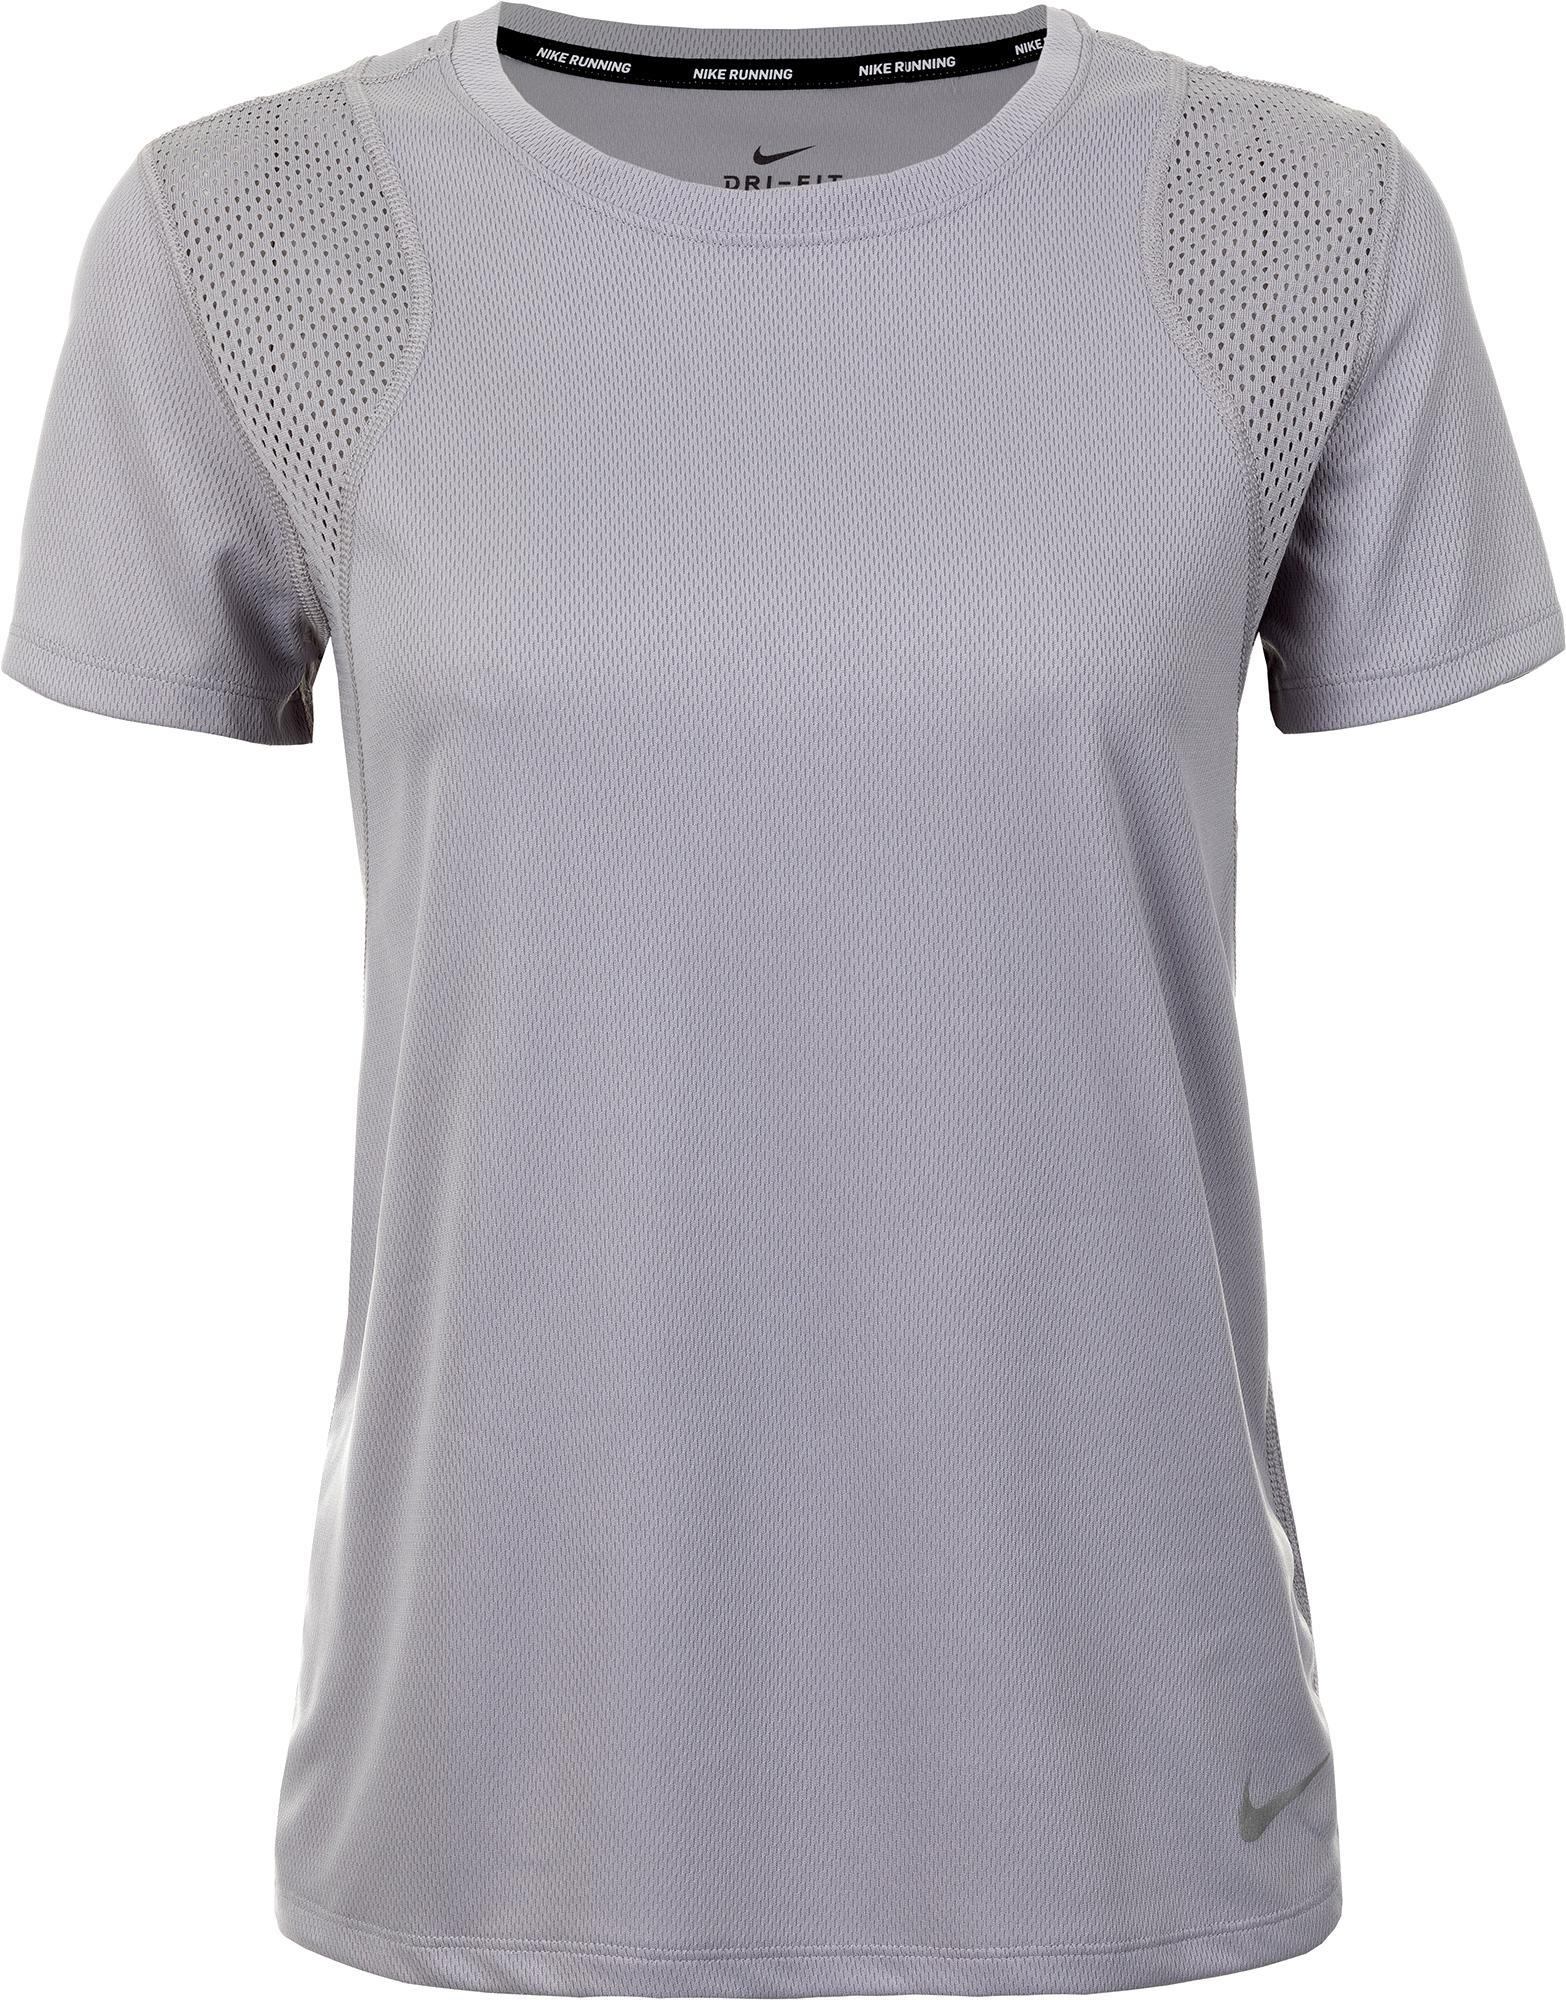 Nike Футболка женская Nike Running, размер 42-44 футболка женская nike pro top цвет белый 889540 100 размер s 42 44